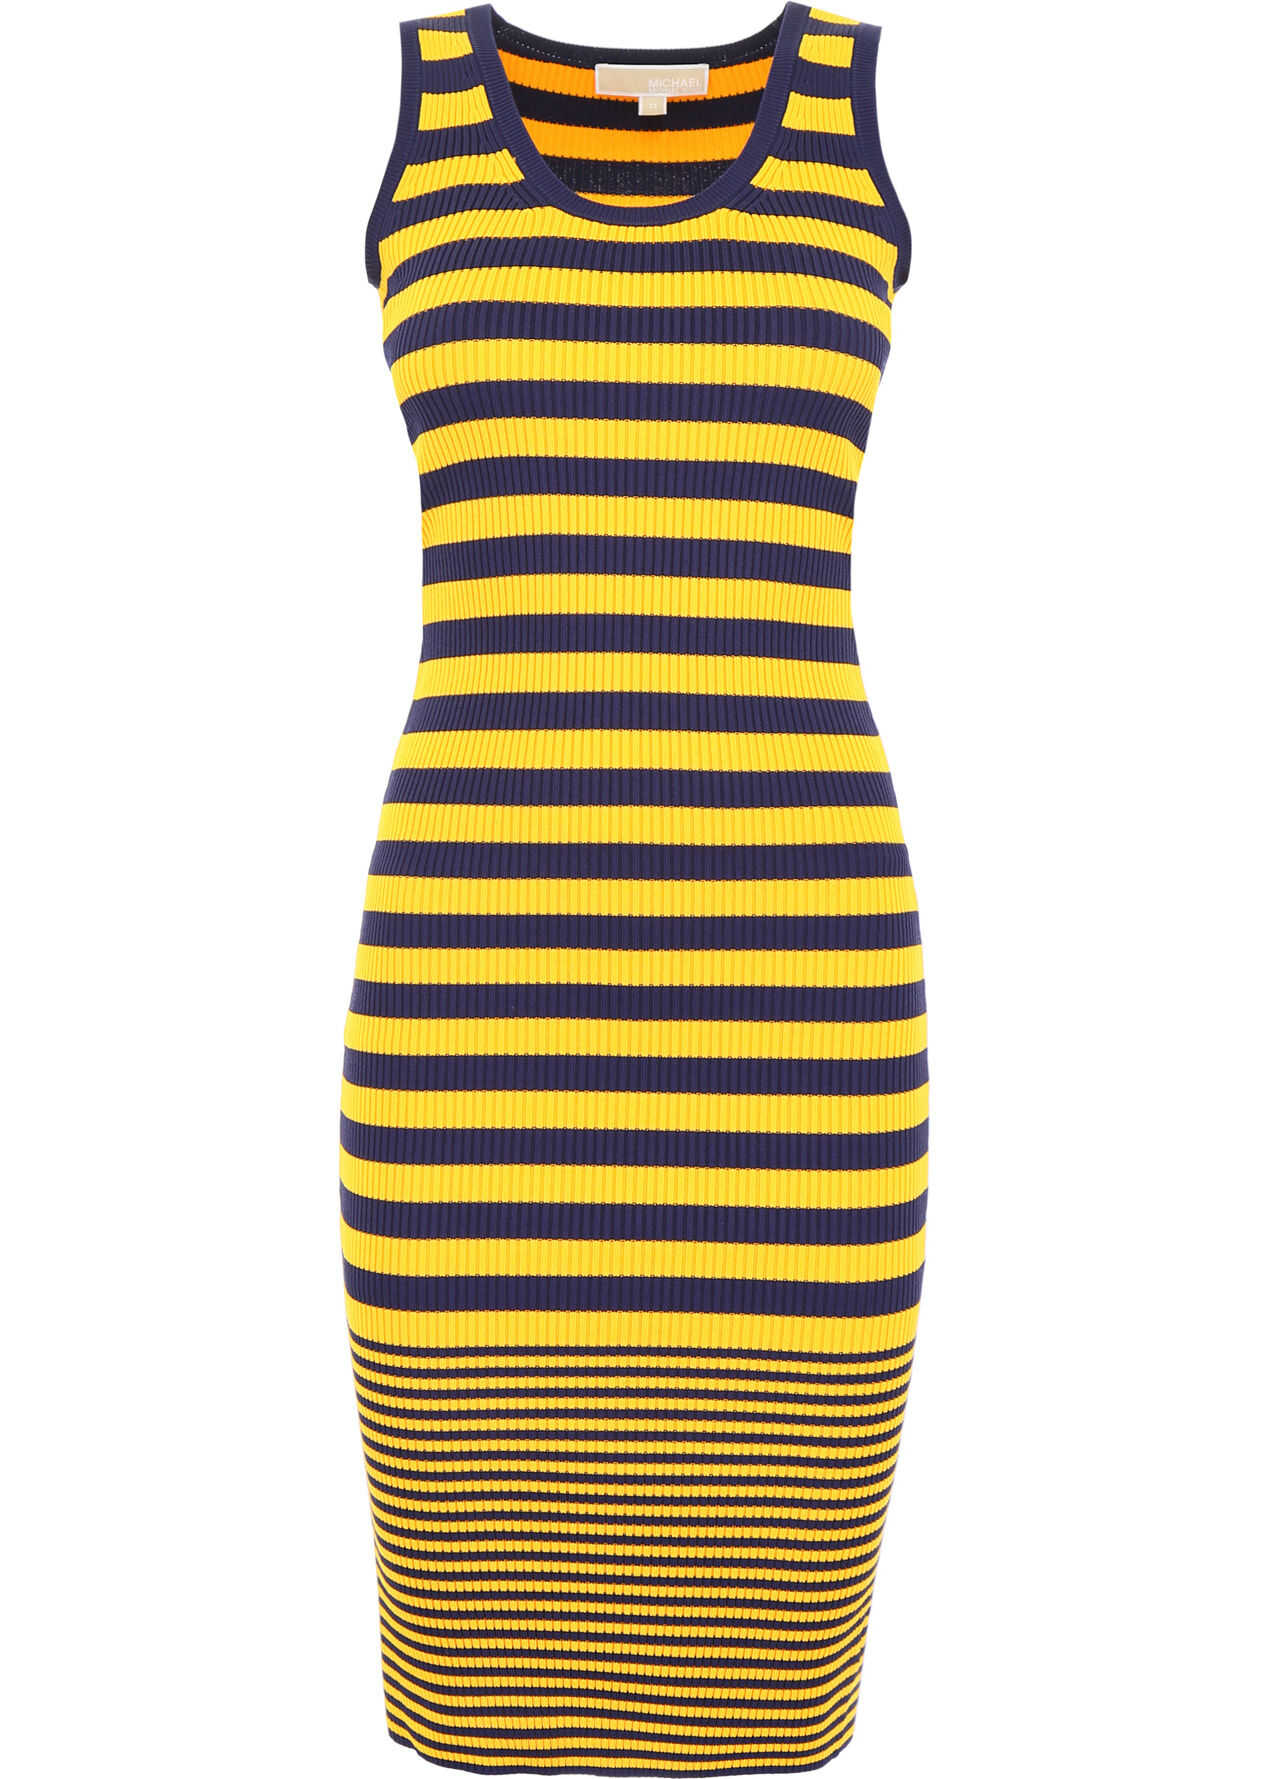 Michael Kors Striped Dress TRNY JSMNYLW